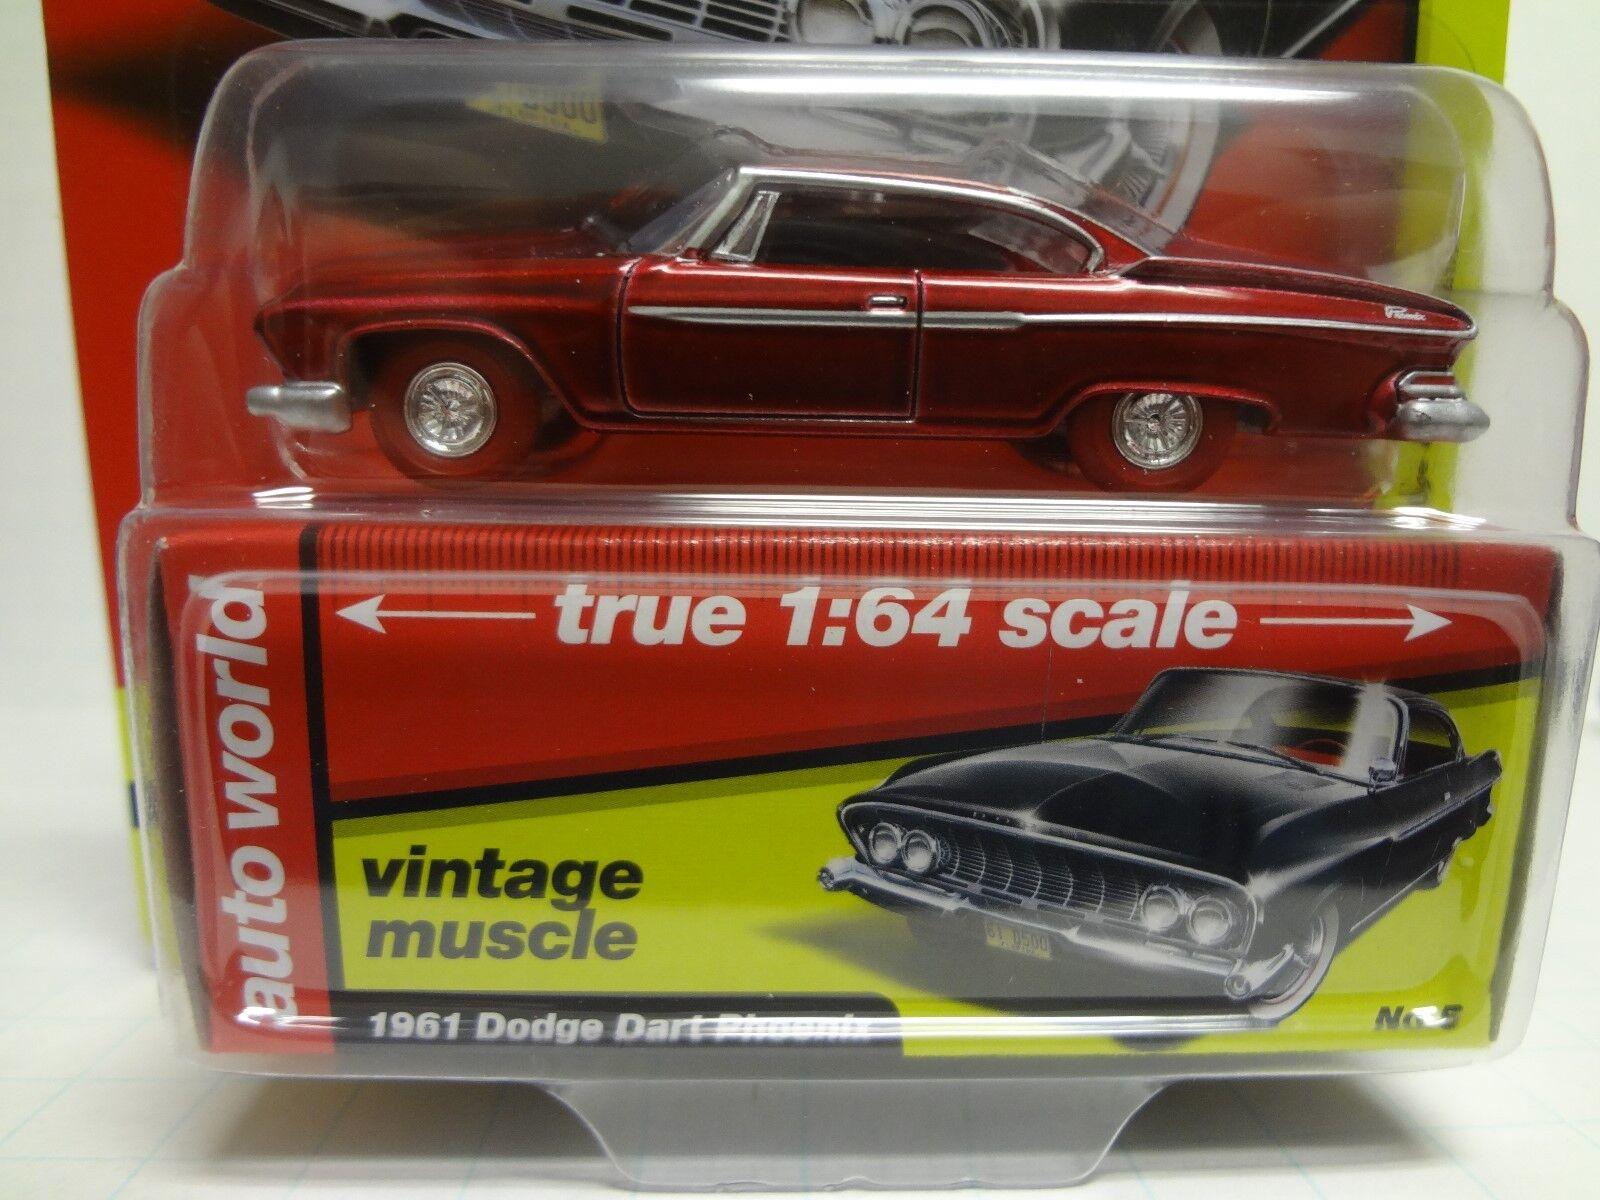 Die auto - welt ultra rot chase 1961 dodge dart phoenix 2018 r2a aw64172 - 18l